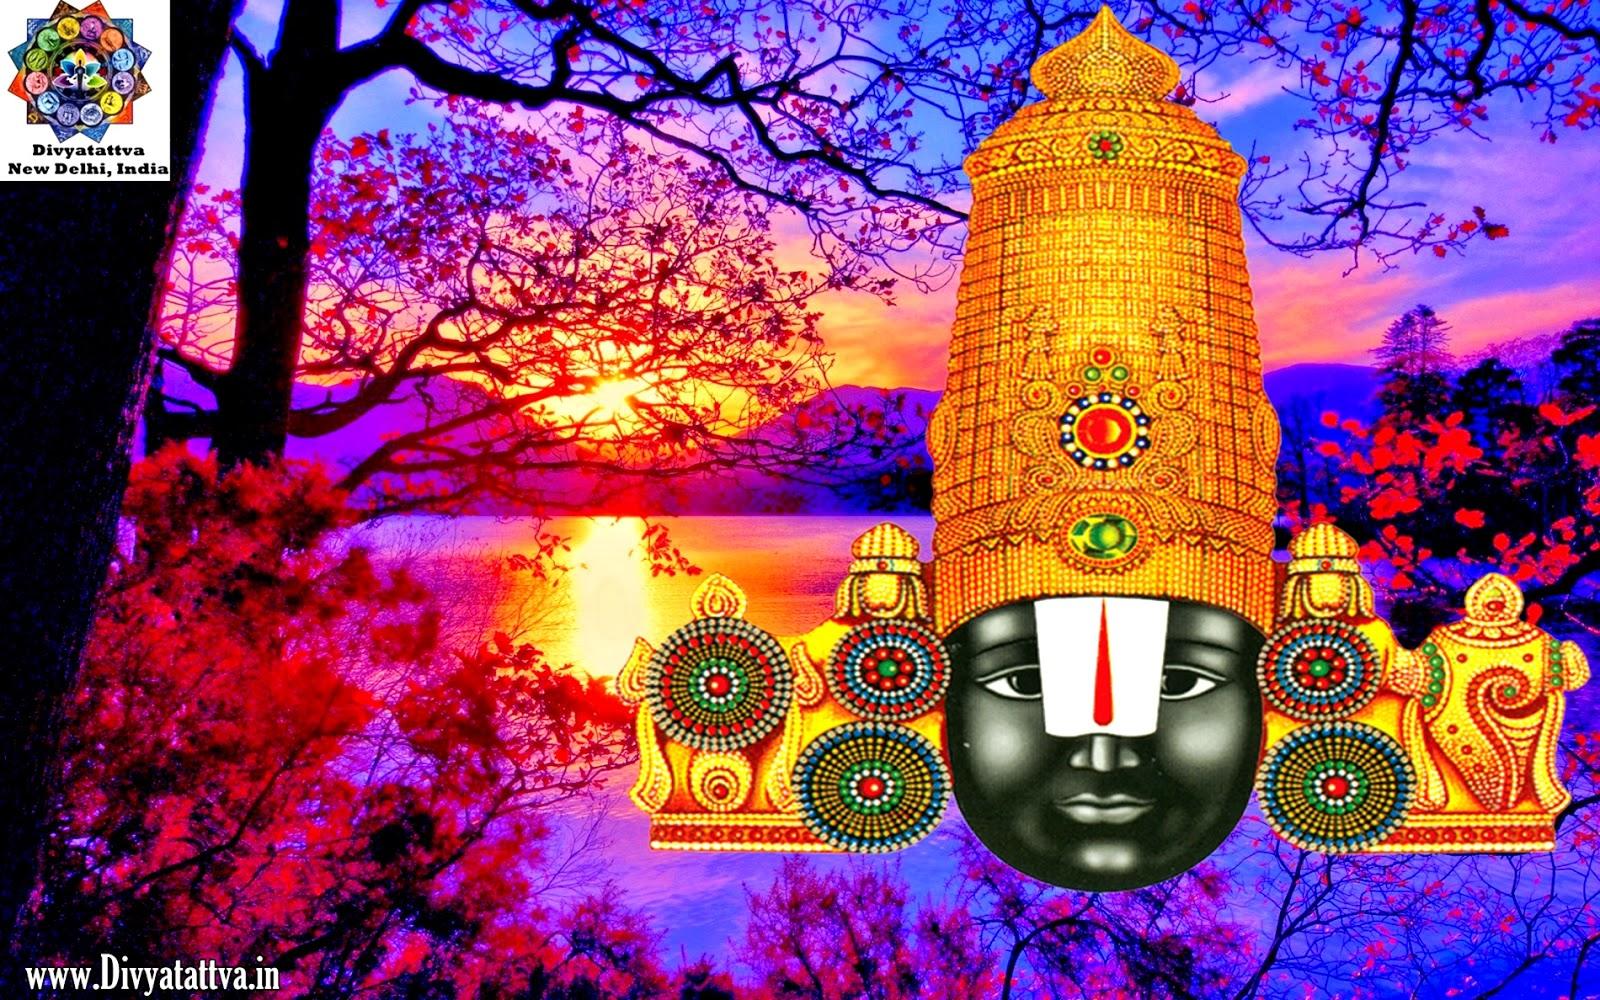 divyatattva astrology free horoscopes psychic tarot yoga tantra occult images videos hindu god balaji wallpapers gallery tirupati balaji hd photos free download hindu god balaji wallpapers